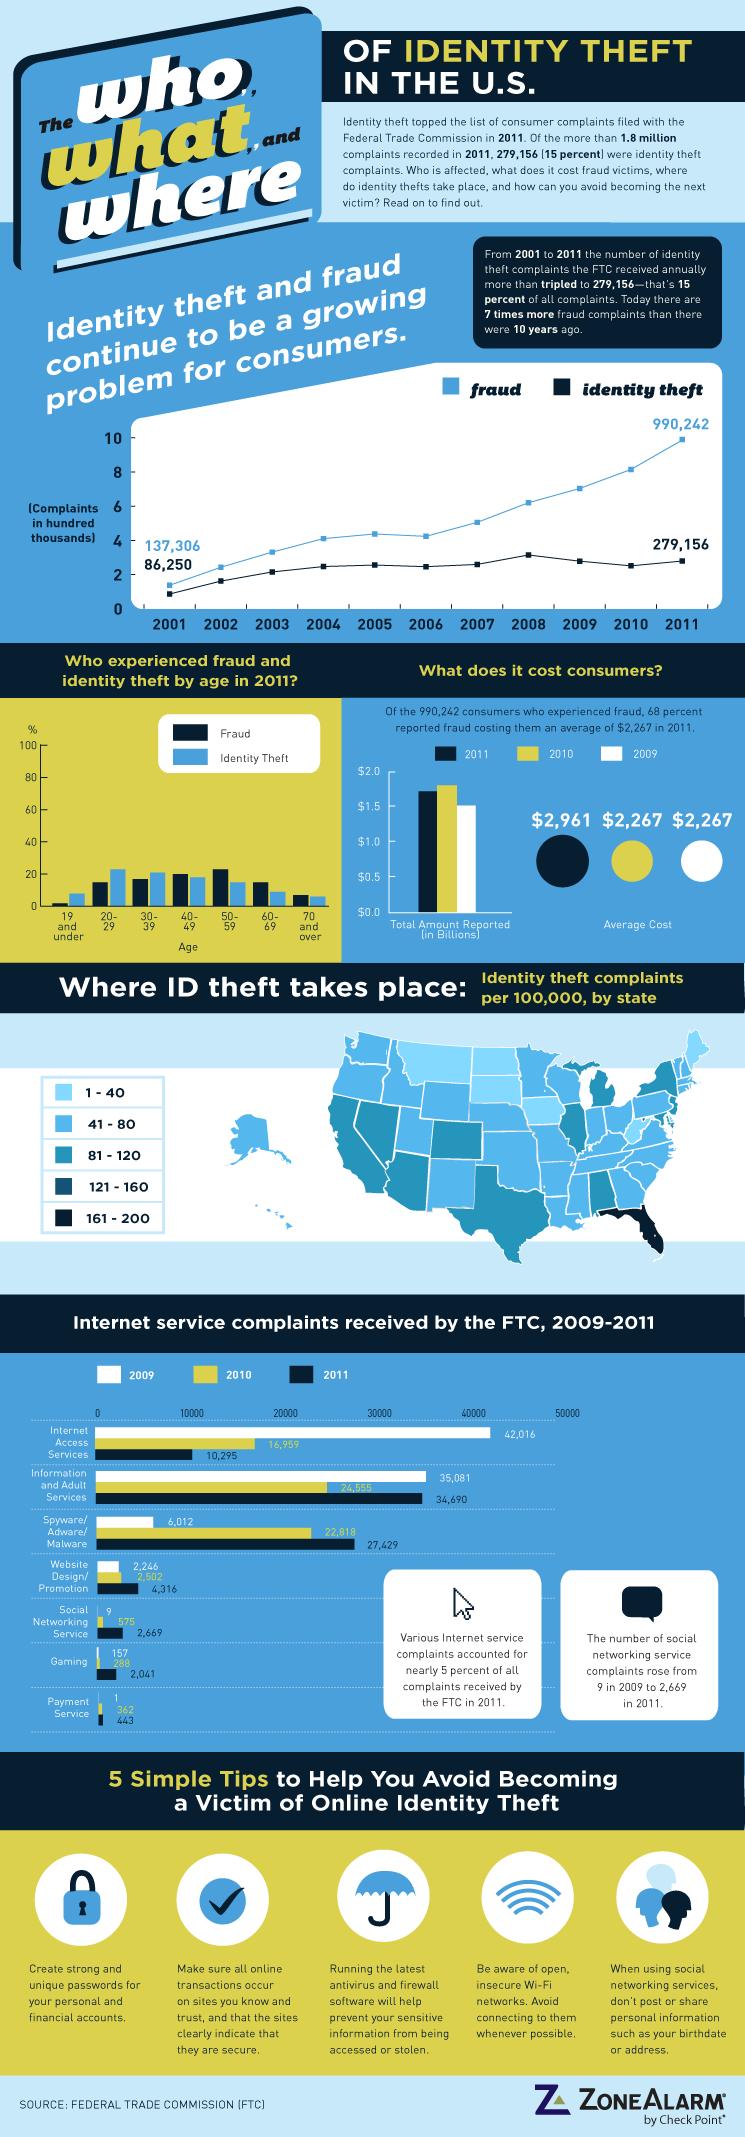 US Identity Theft Statistics